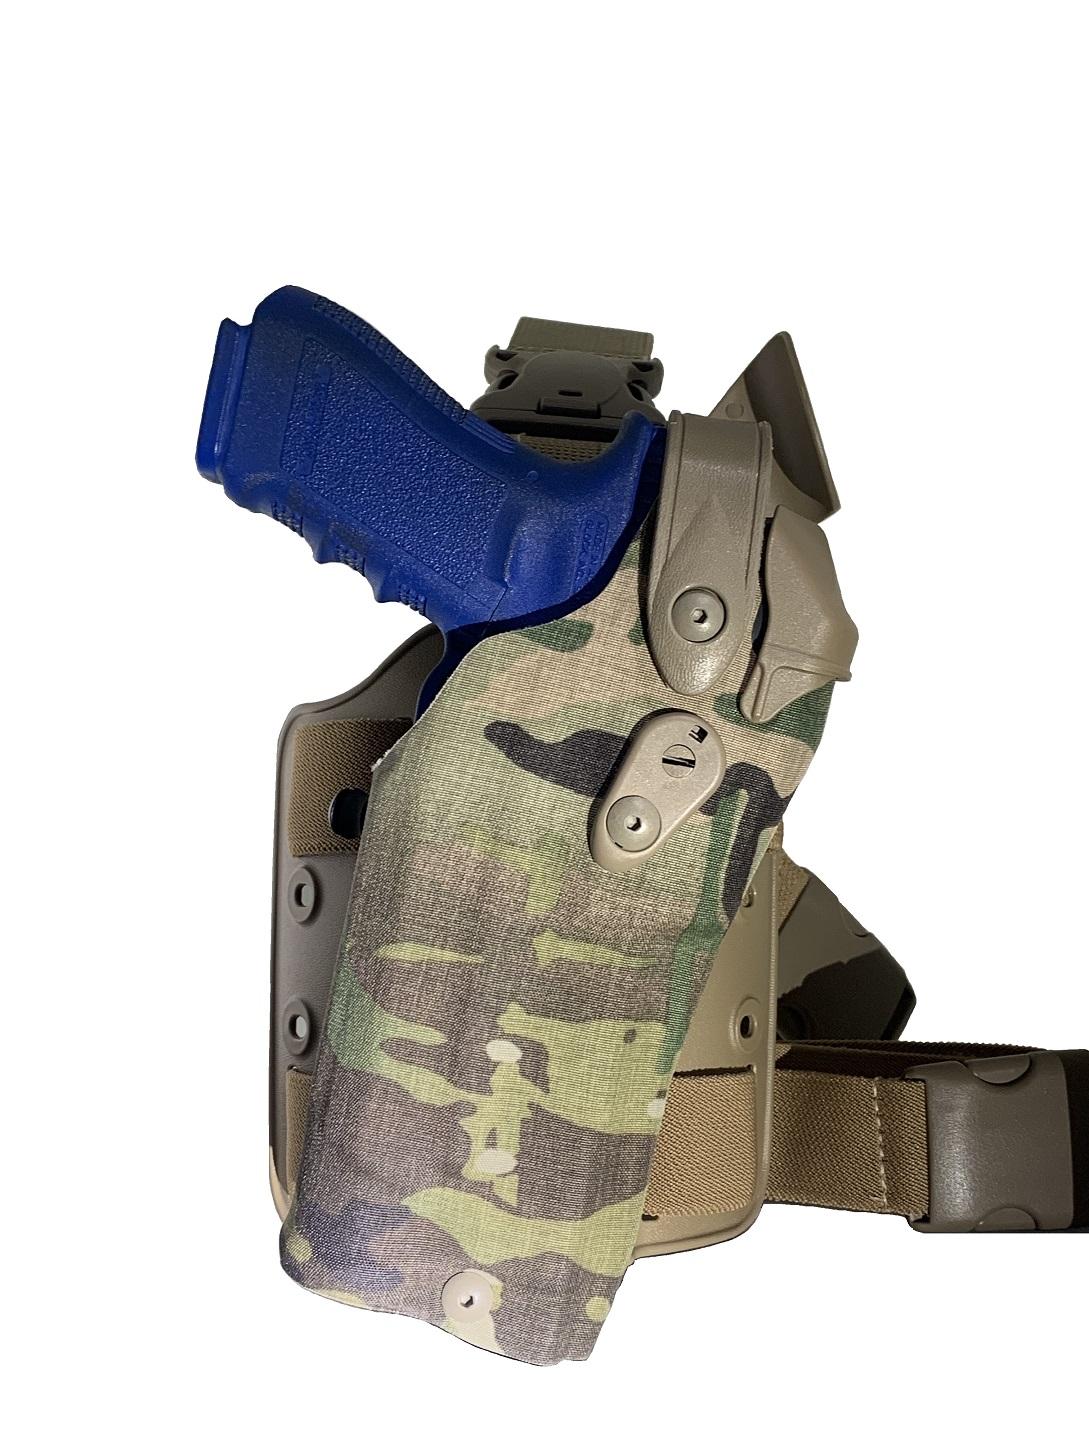 Coldre 6305RDS Multicam c/ Lanterna - Glock 17/22 - Safariland